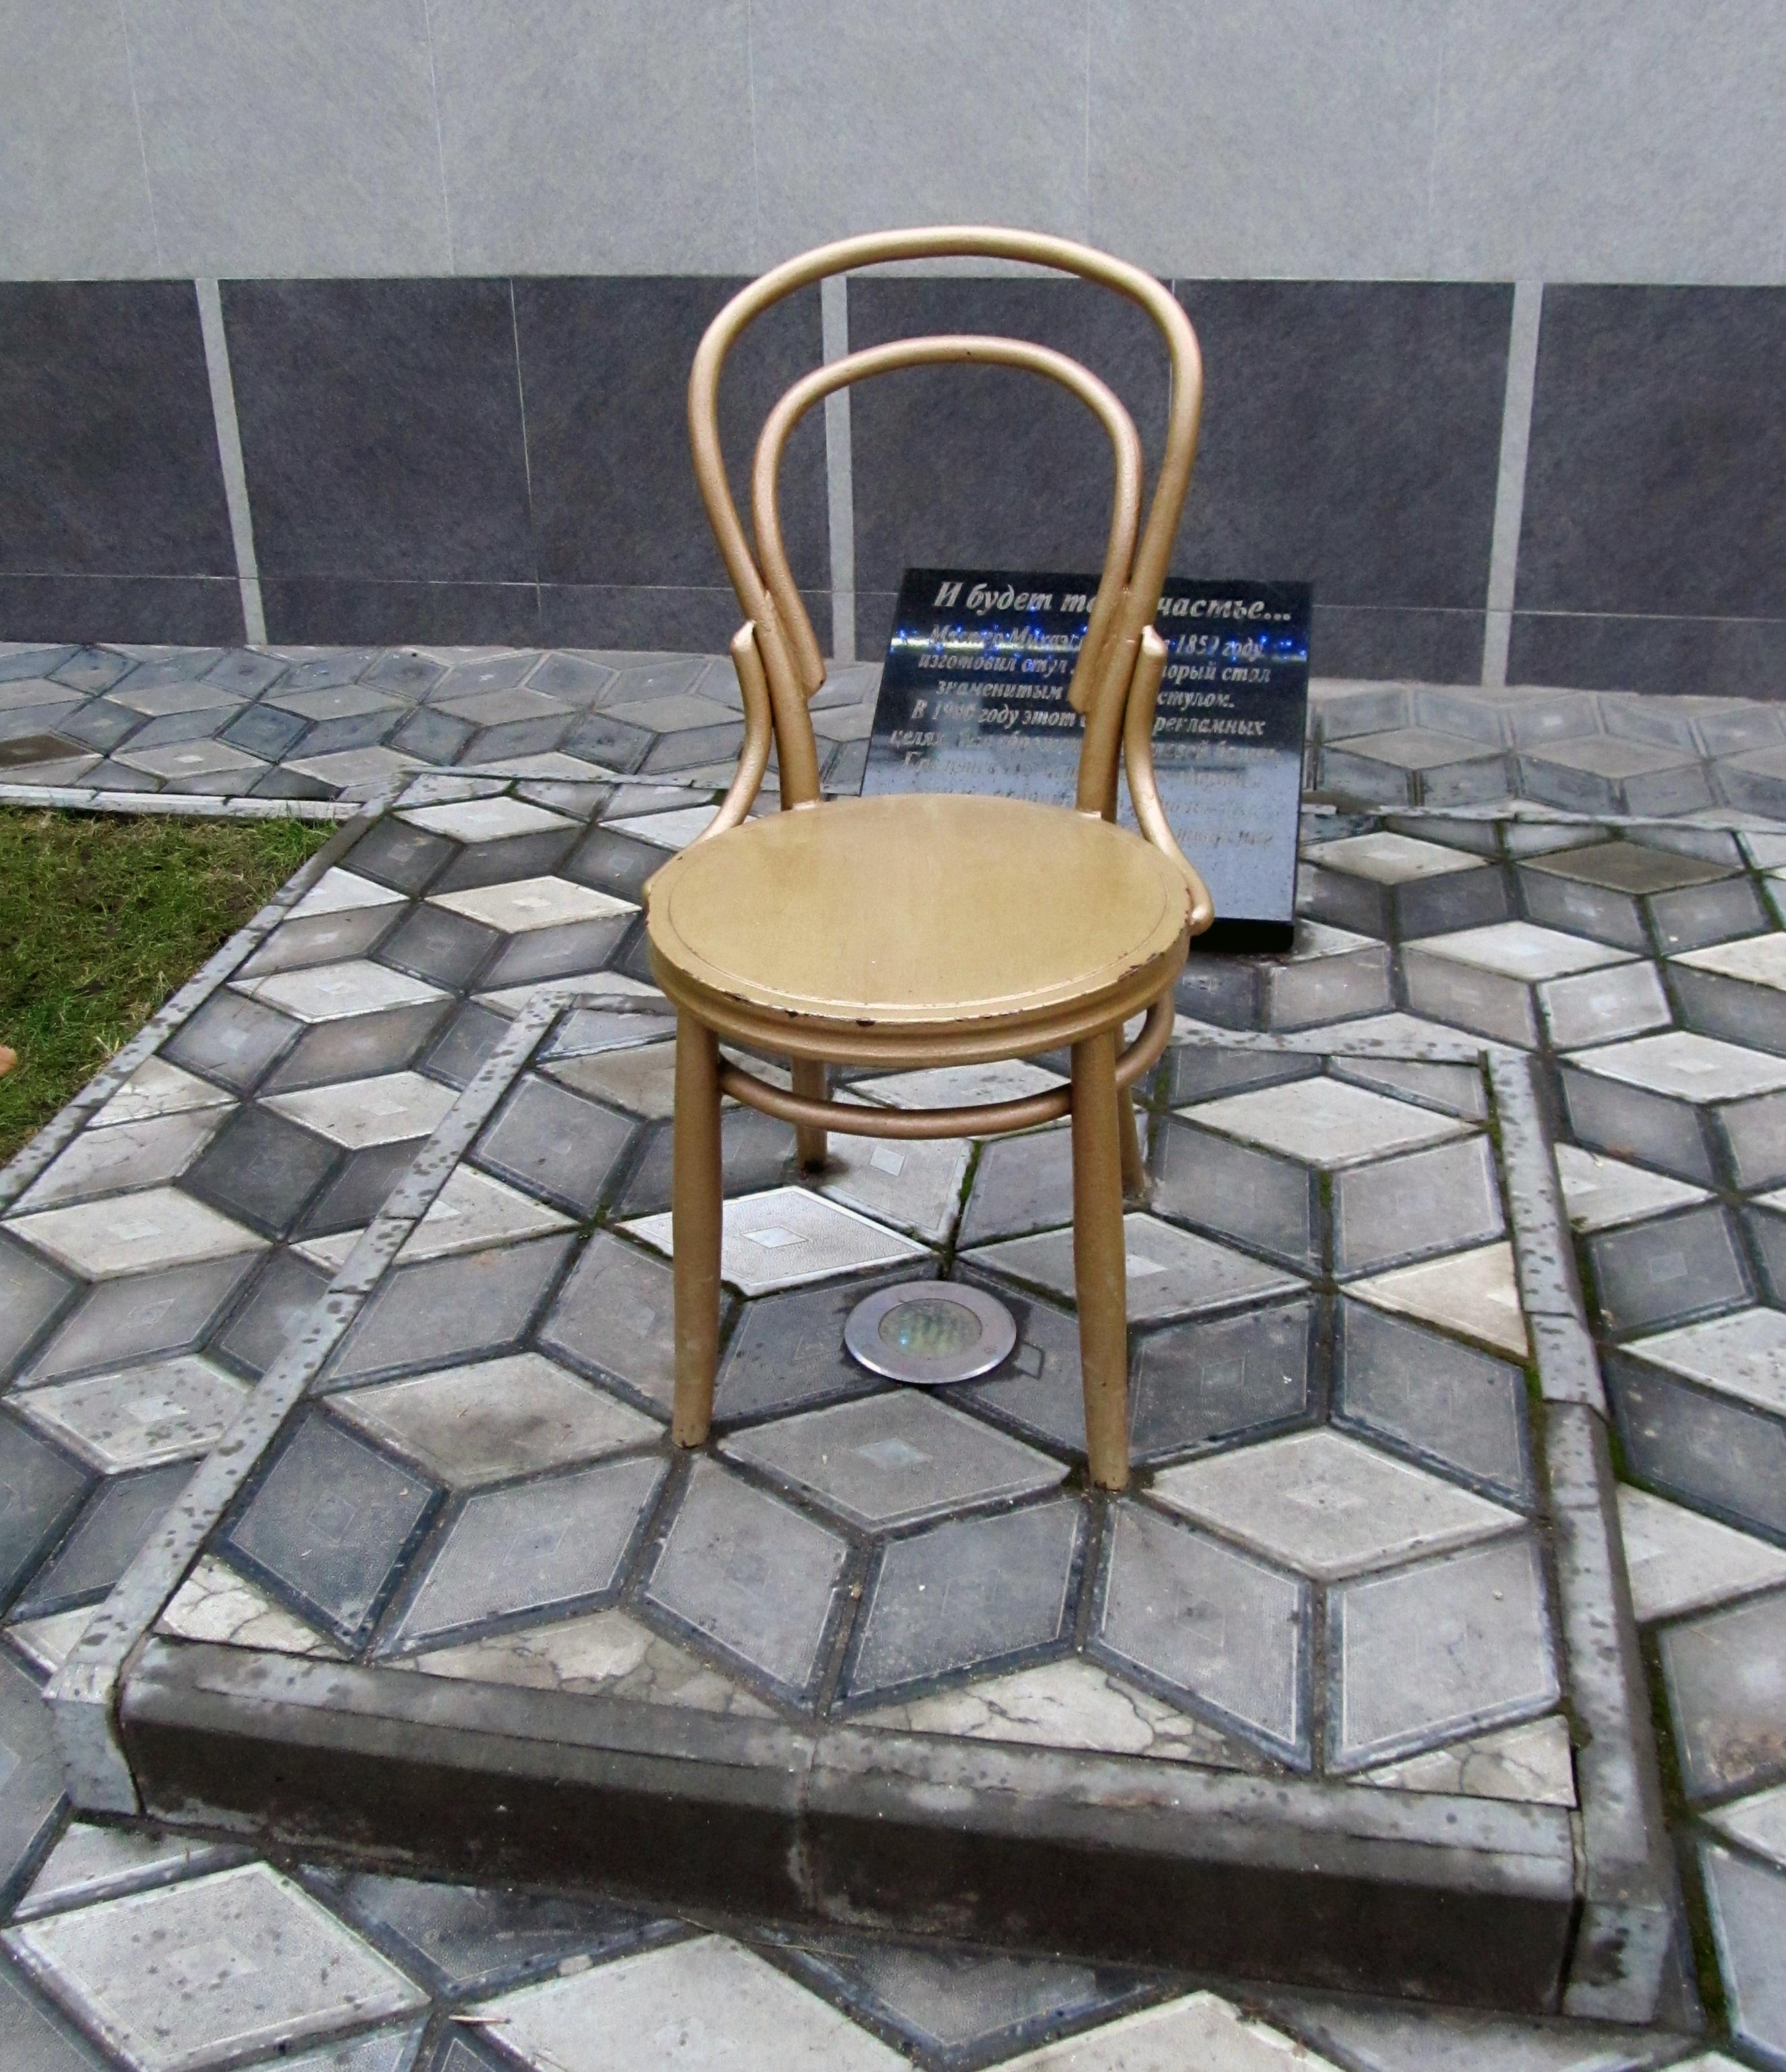 File:Monument to Michael Thonet's chair in Melitopol (Zaporizhia Oblast, Ukraine).JPG